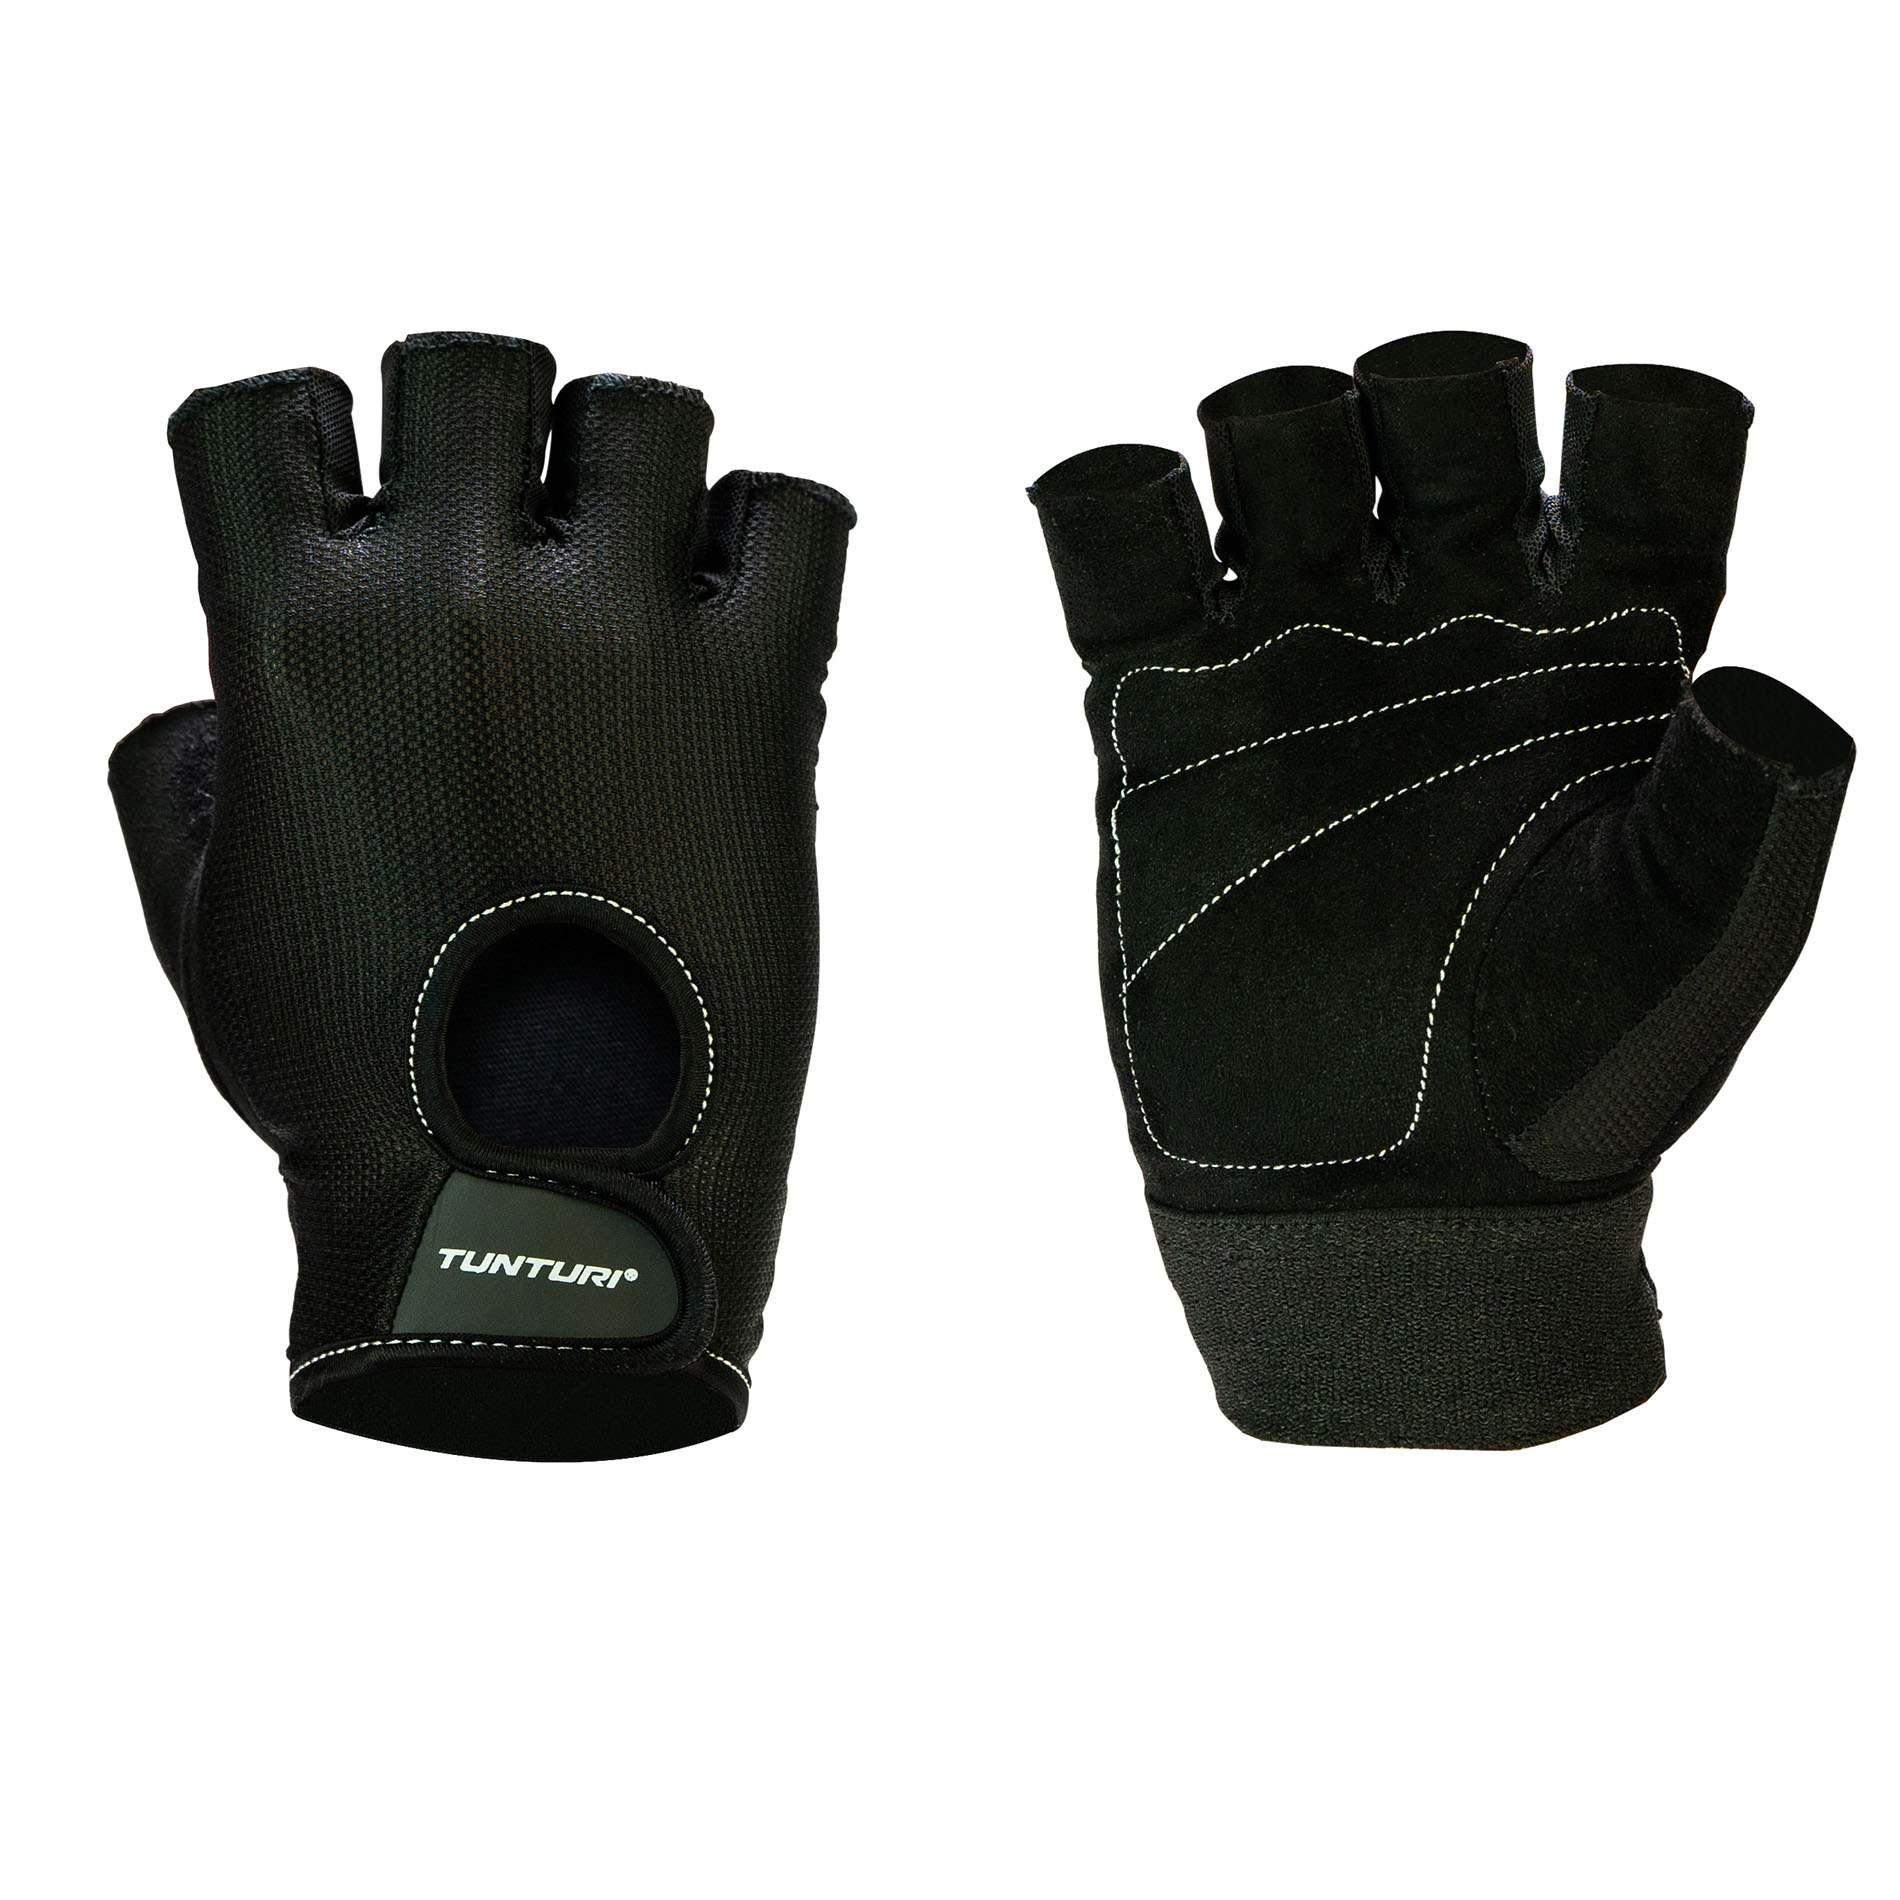 Handschoenen - Sporthandschoenen - Easy Fit Pro